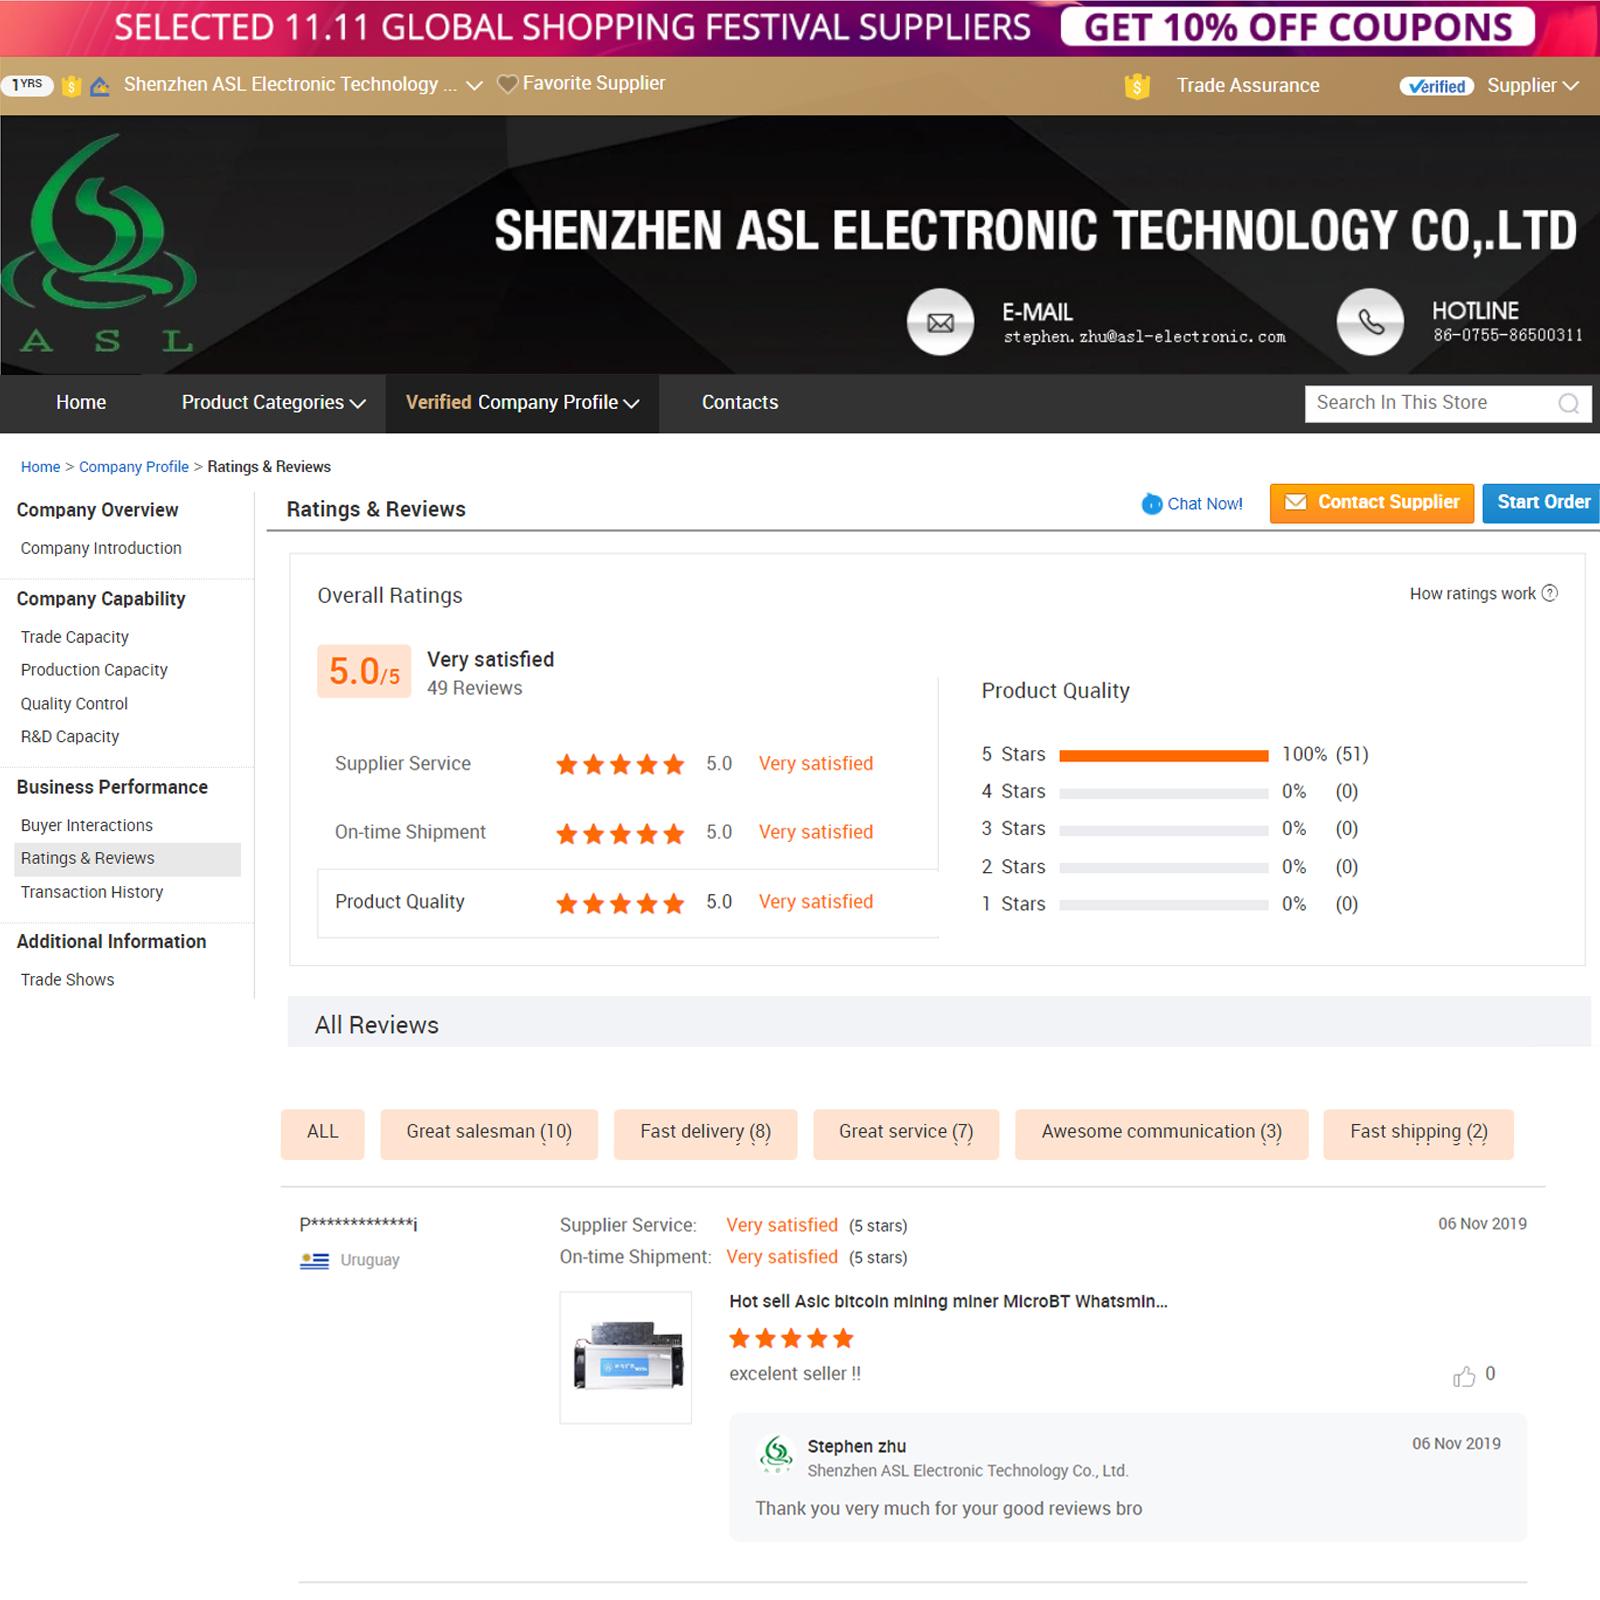 Shenzhen ASL 2019 bitmain en çok satan antminer s4 s3 440 ghs psu dahil s9 s9i s9j s9k s9se 13t 13.5t 14t 14.5t 16t